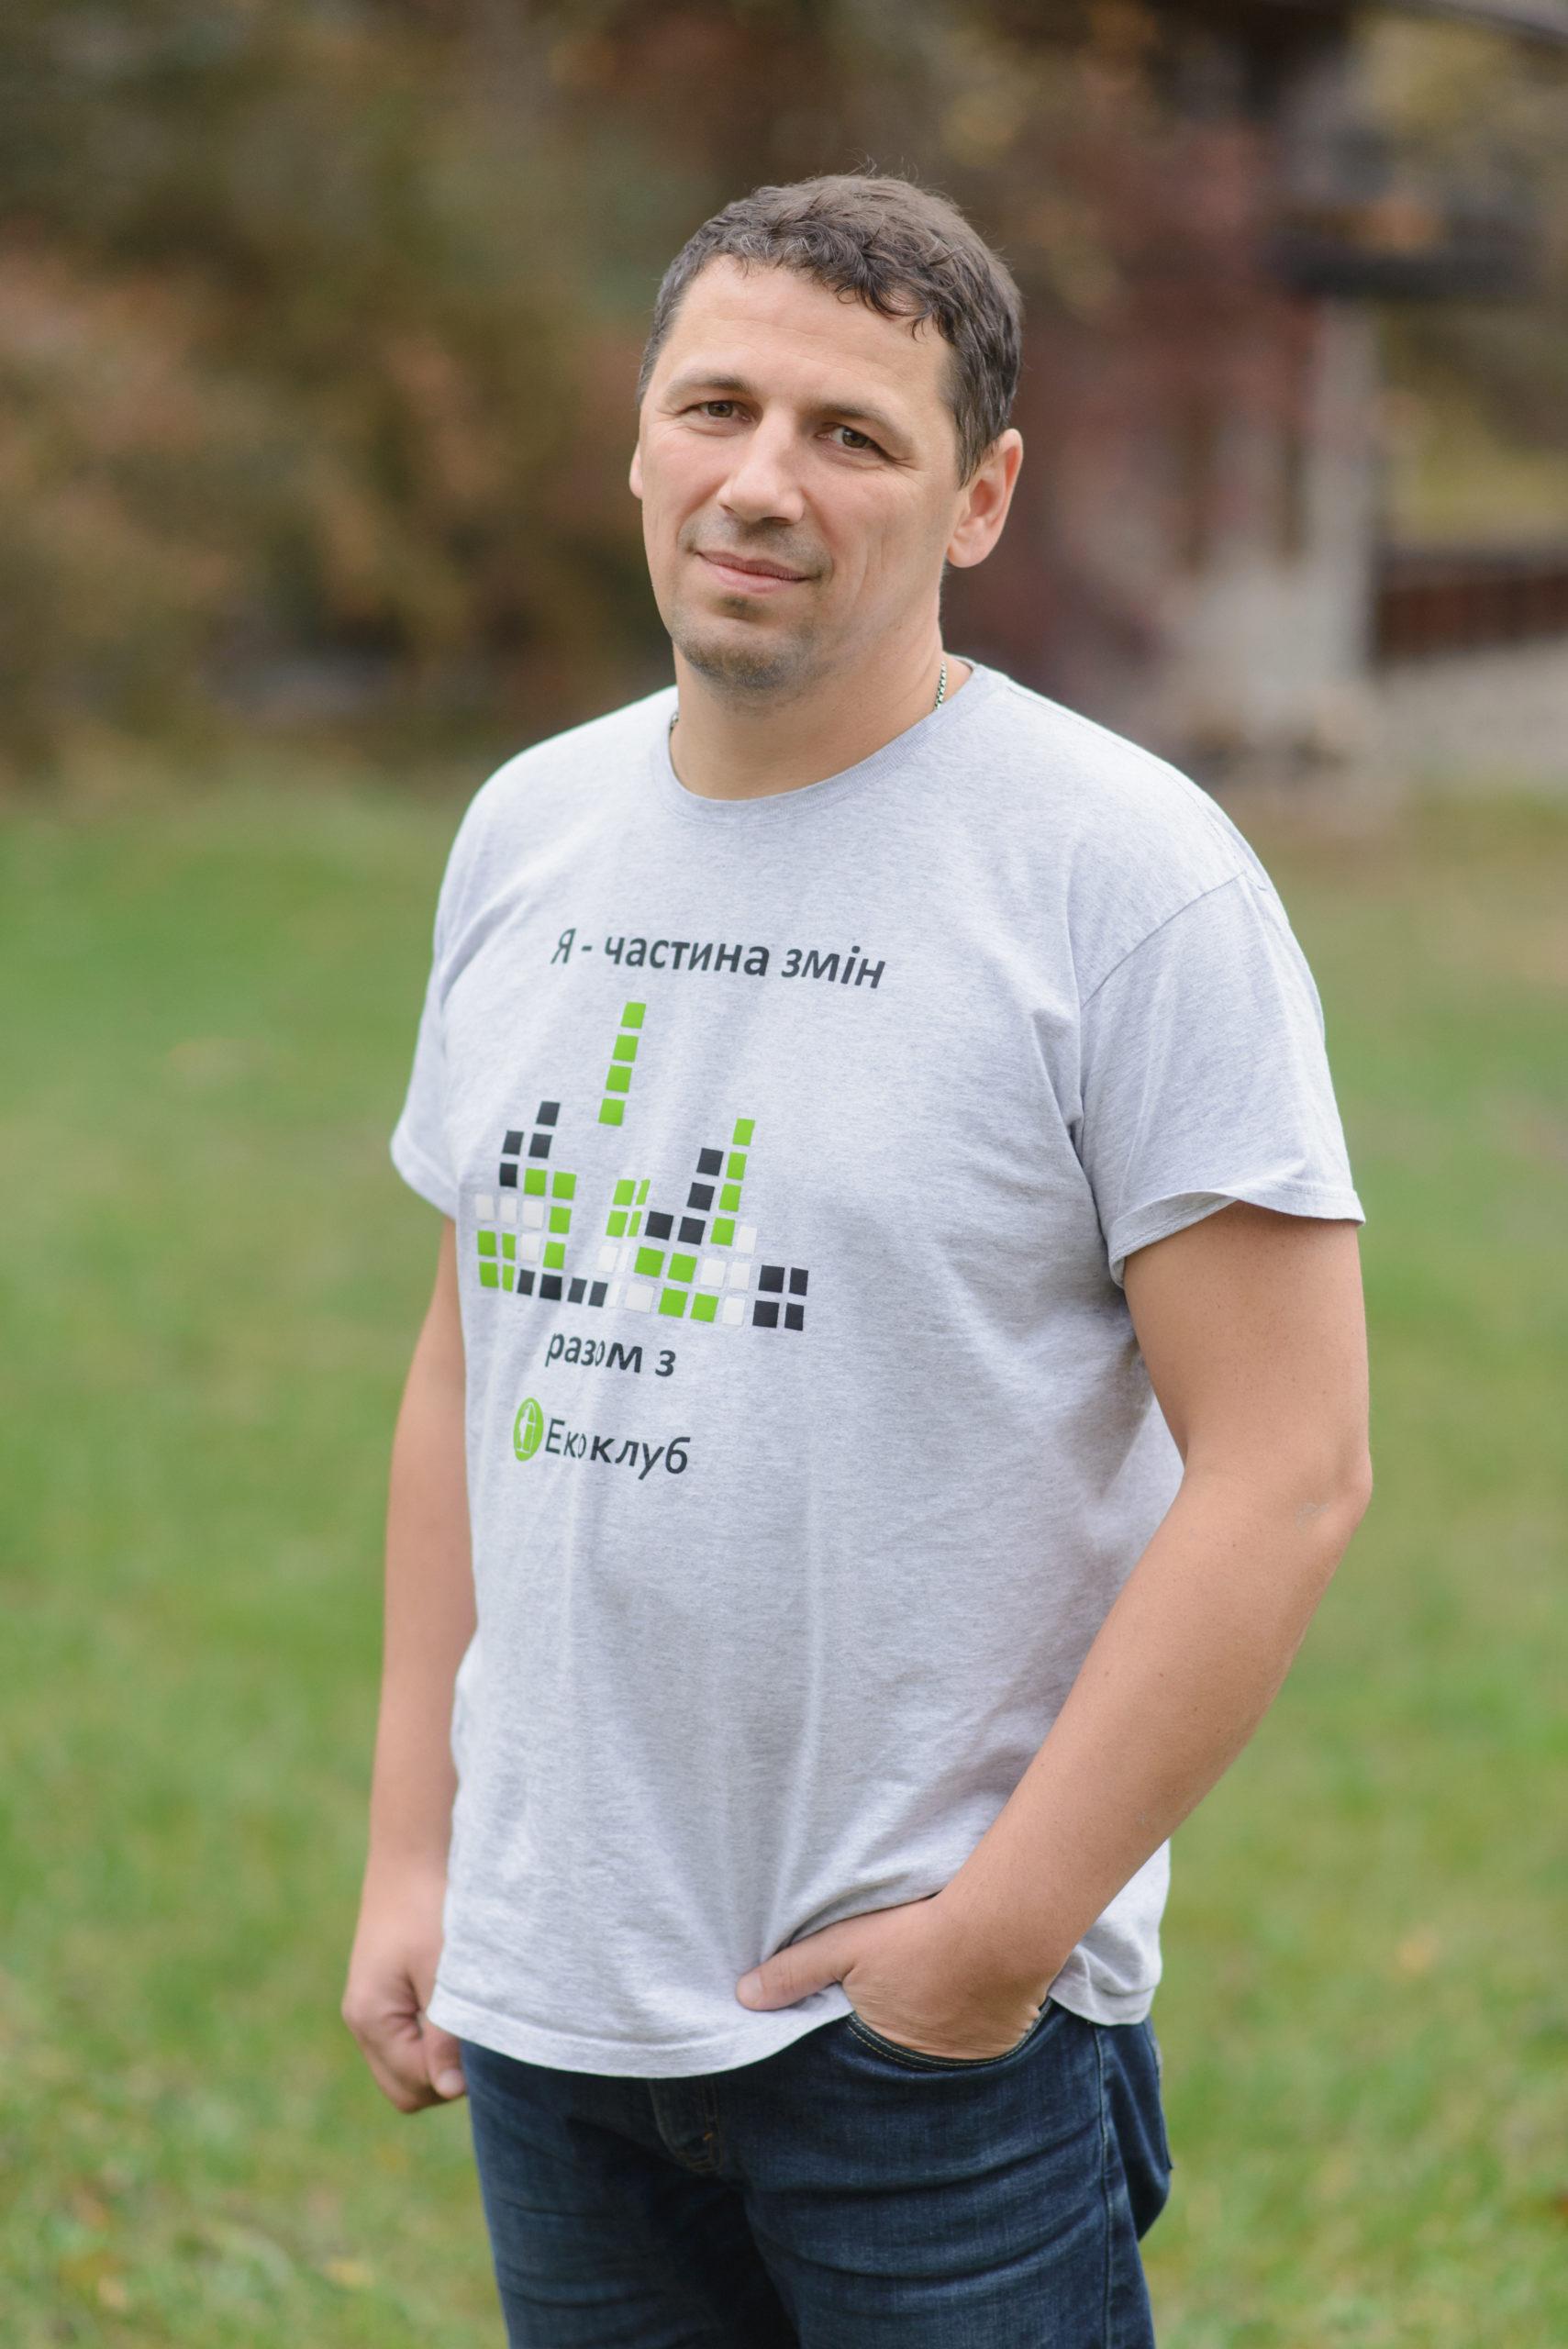 Andriy Martynyuk